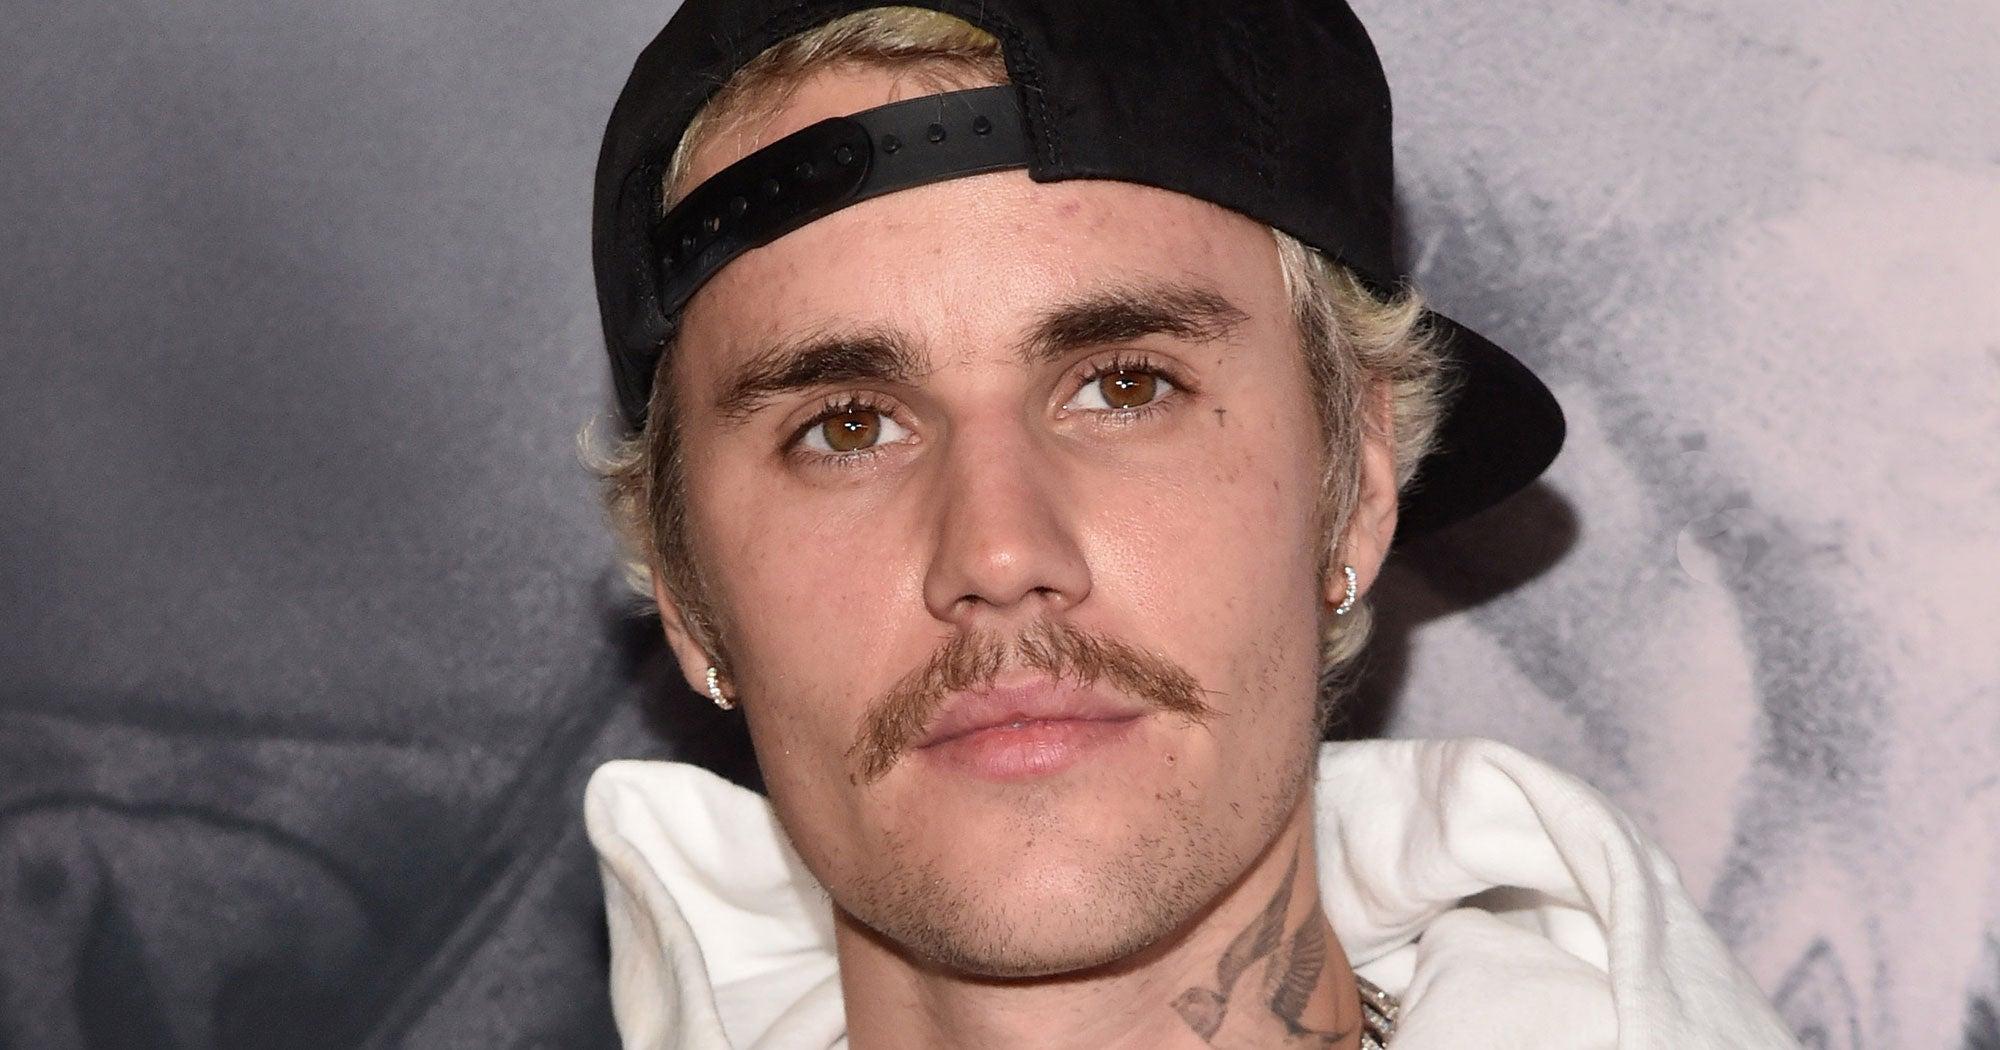 Justin Bieber Gets Emotional Talking About Billie Eilish